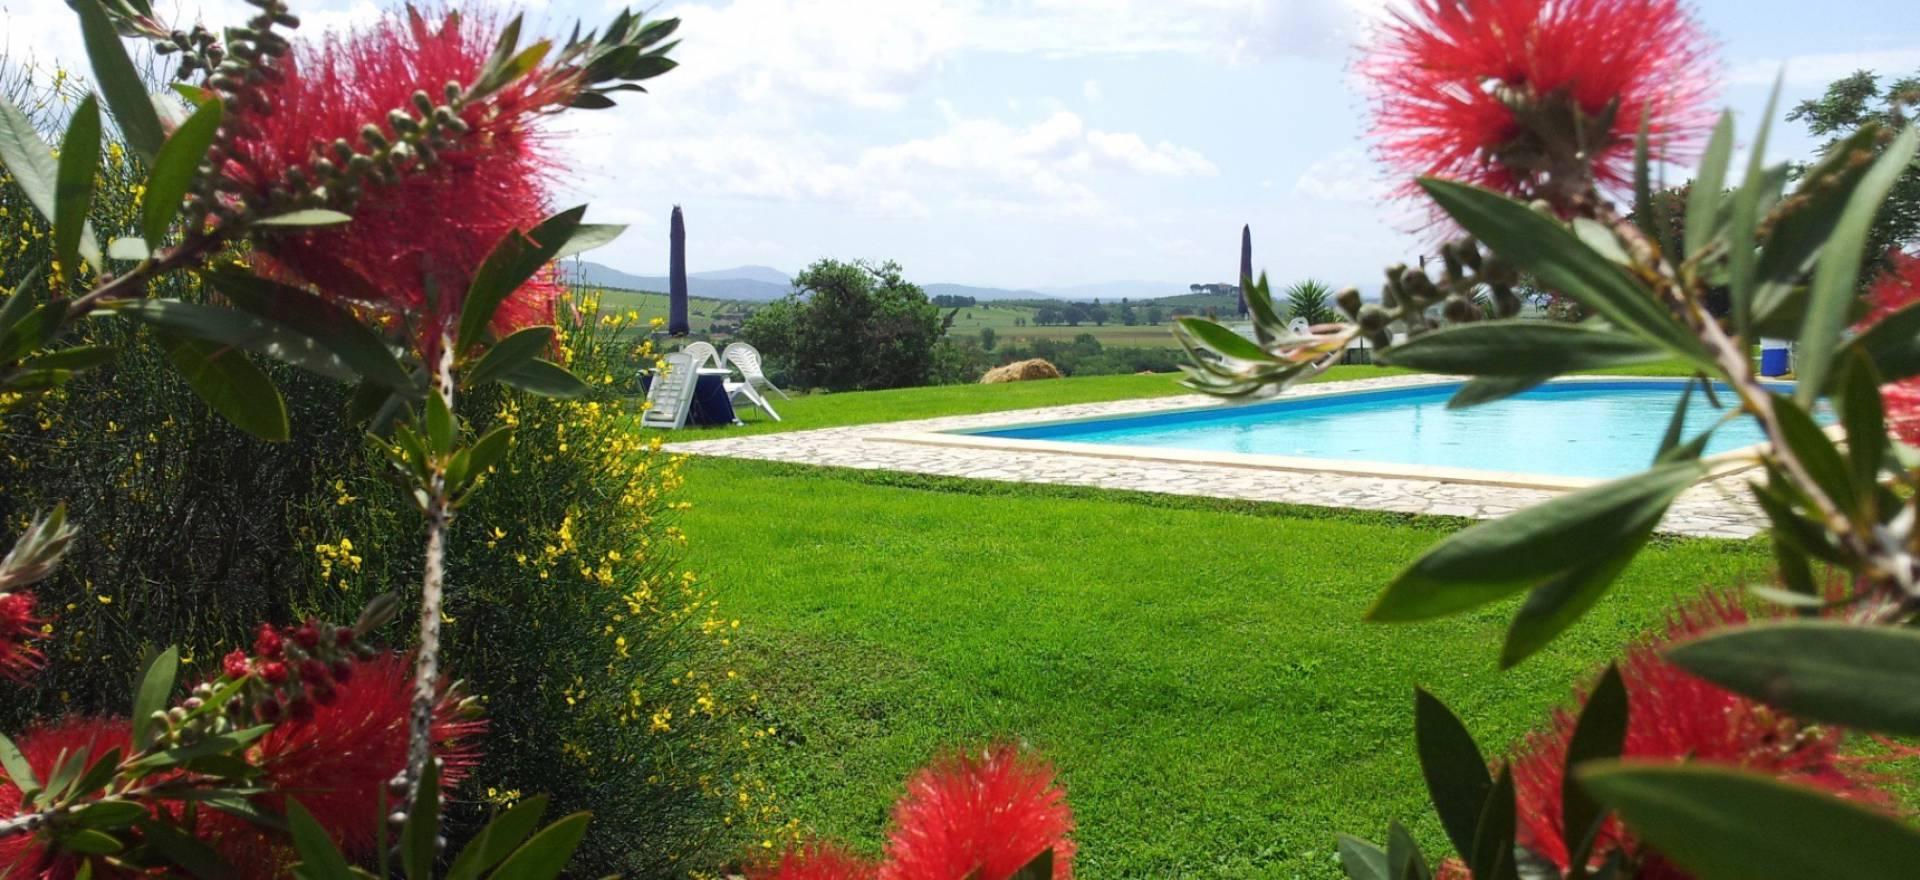 Agriturismo Toscane Rustig gelegen agriturismo vlakbij Toscaanse kust